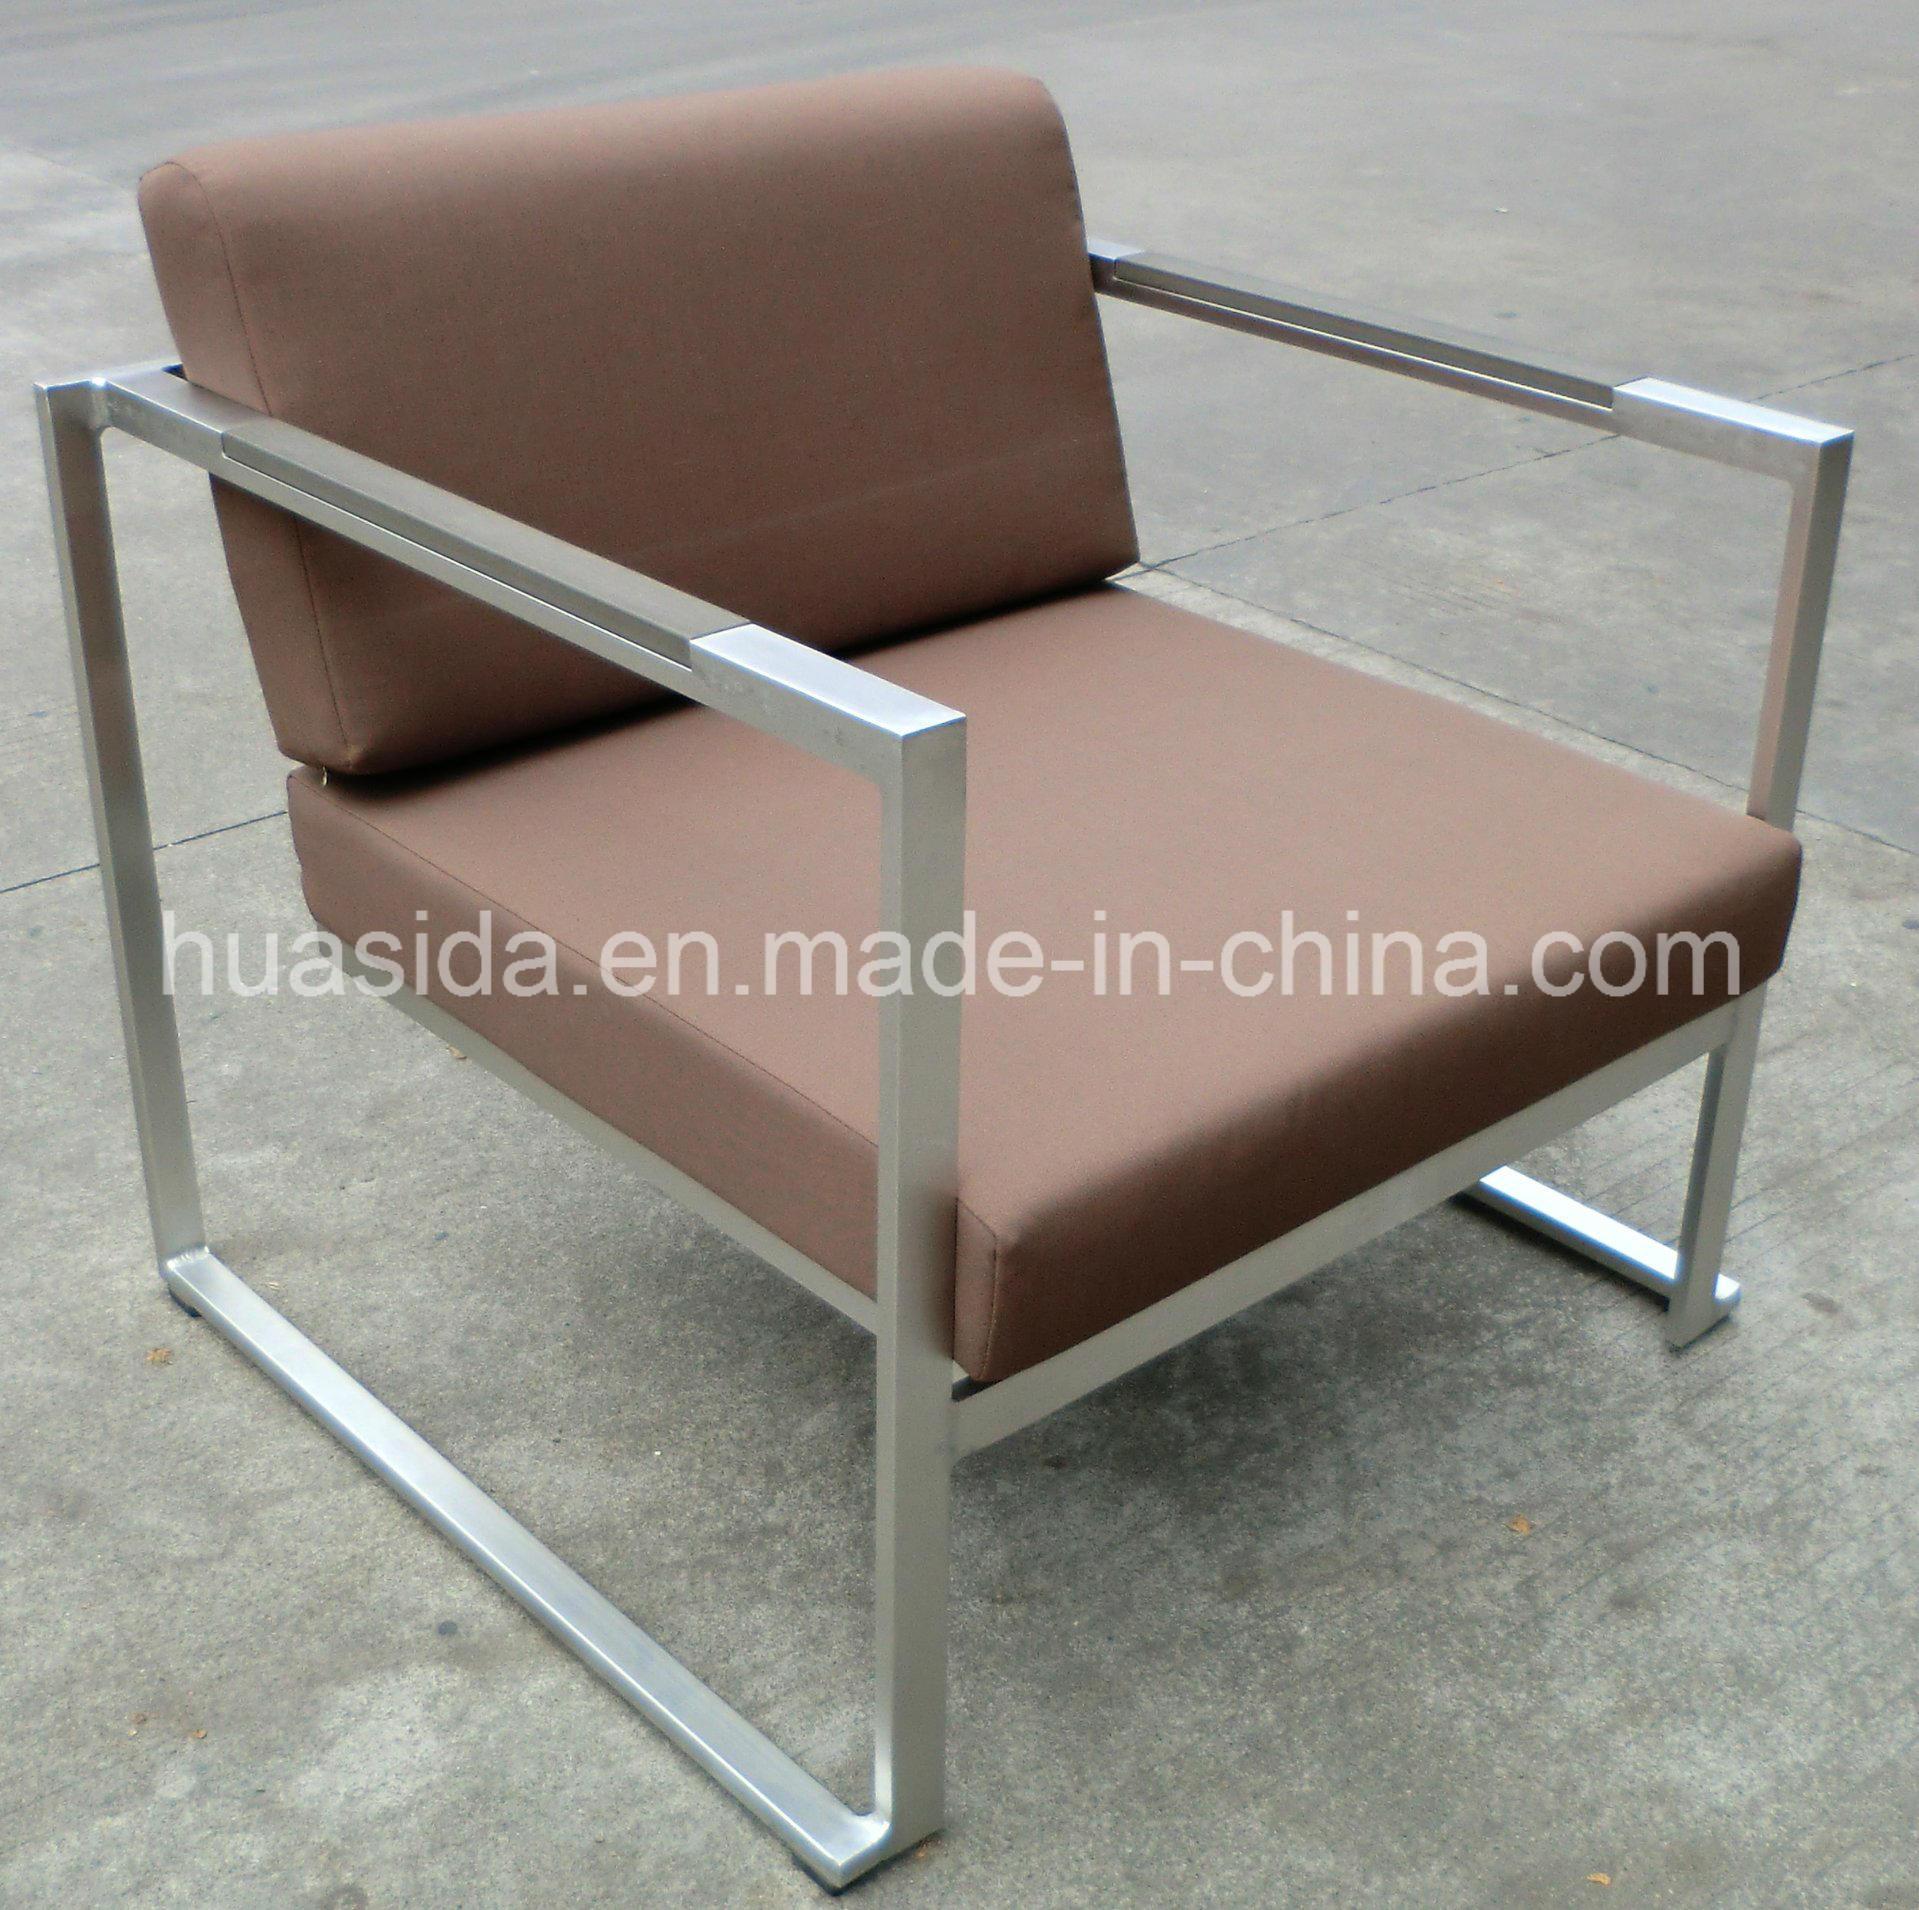 Outdoor 4-PCS Waterproof 304 Stainless Steel Sofa Set